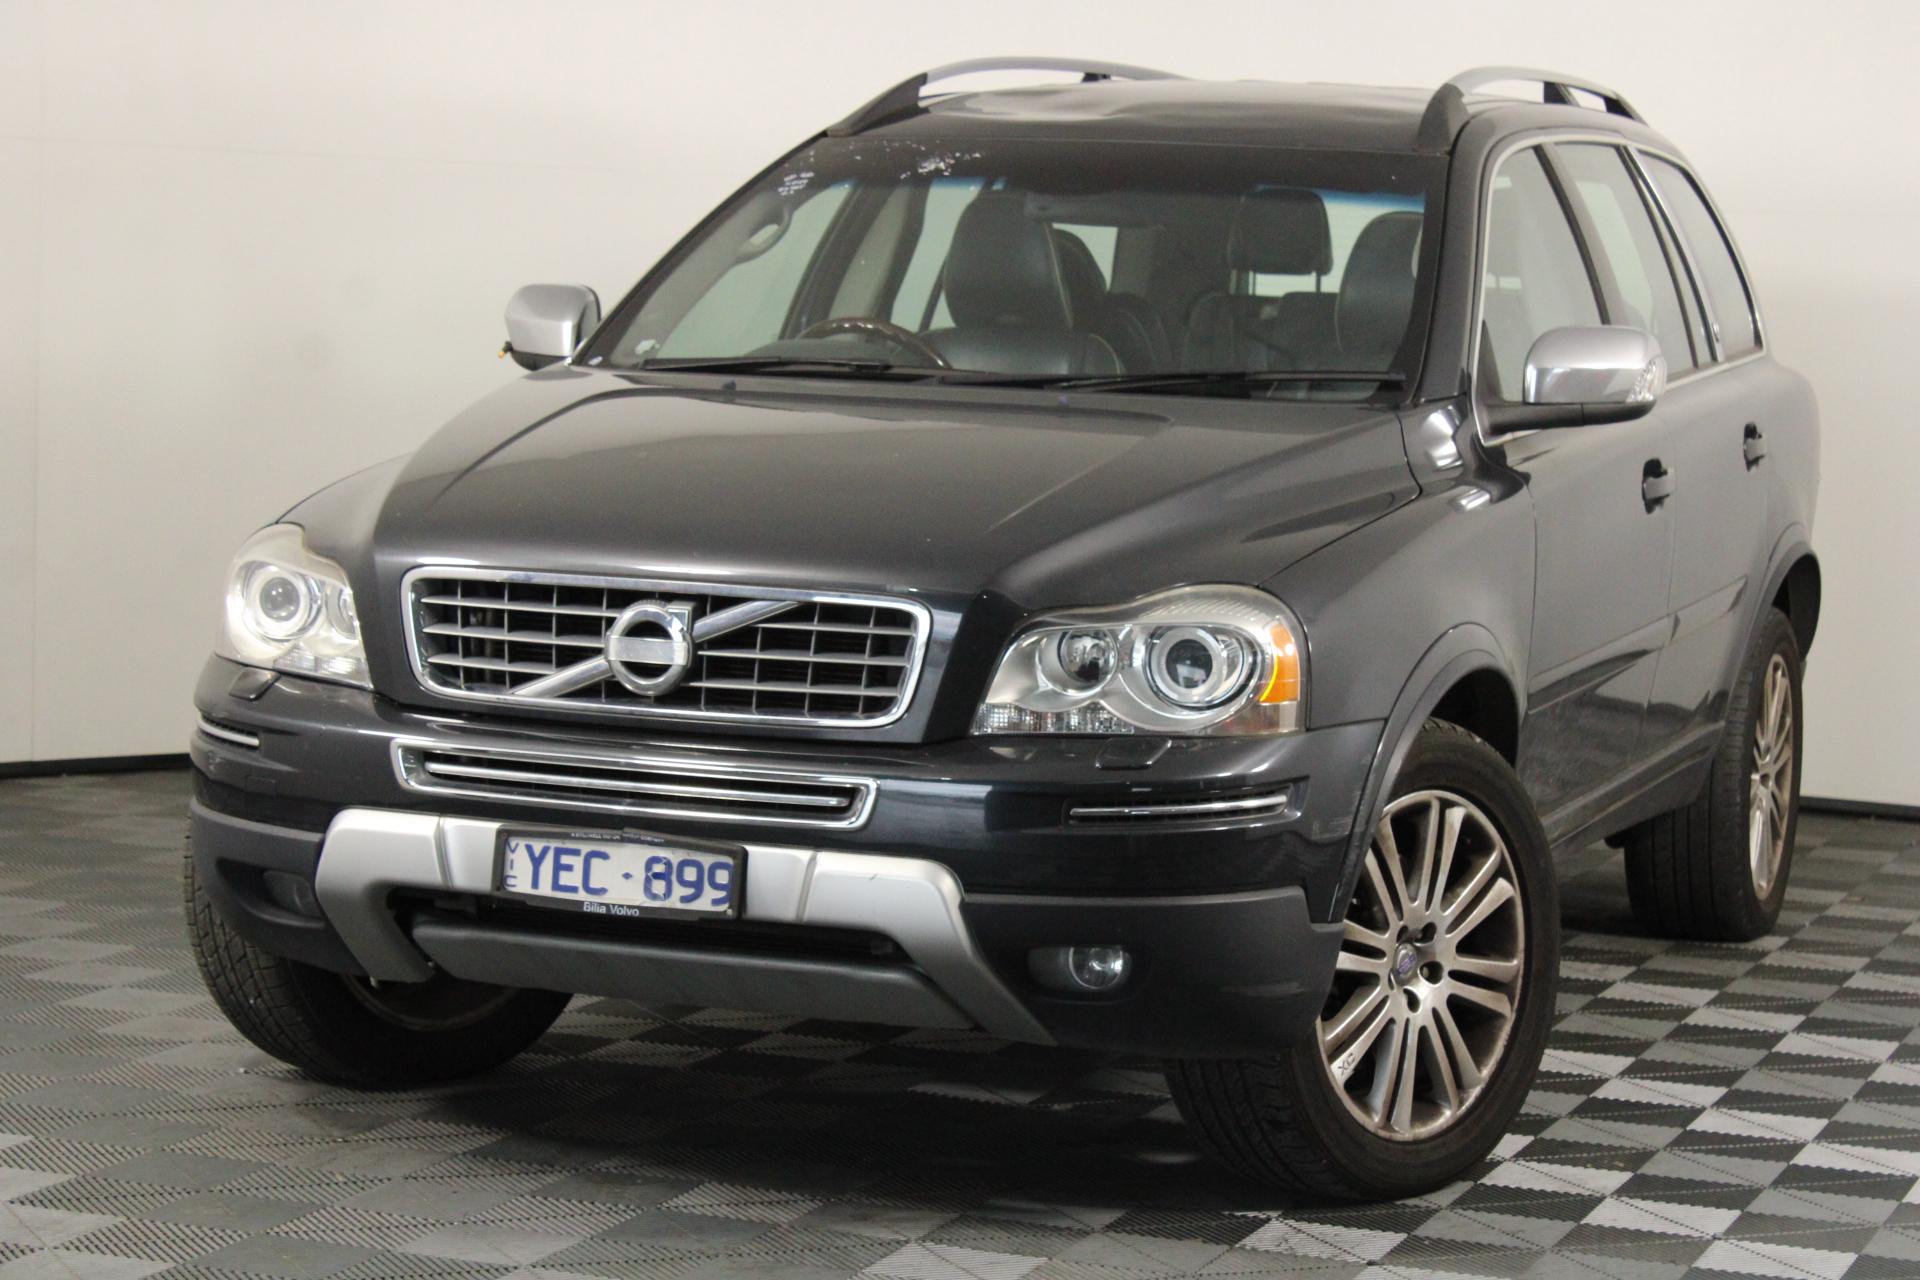 2011 Volvo XC90 3.2 Executive Automatic 7 Seats Wagon